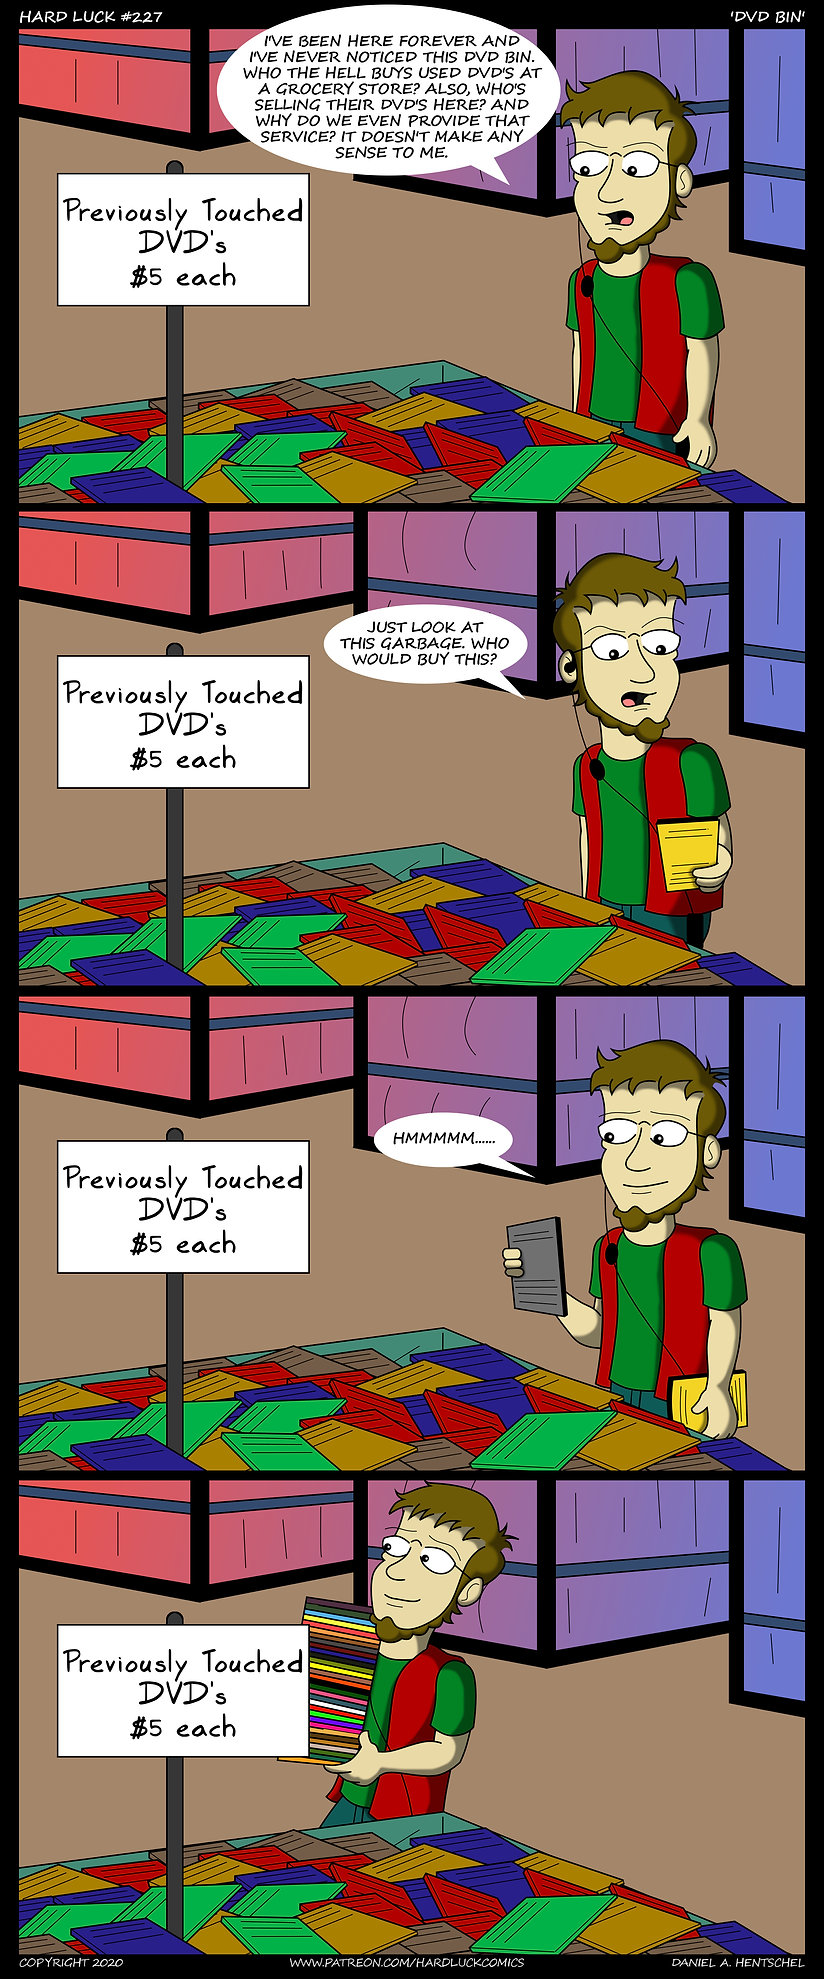 DvdBin.jpg